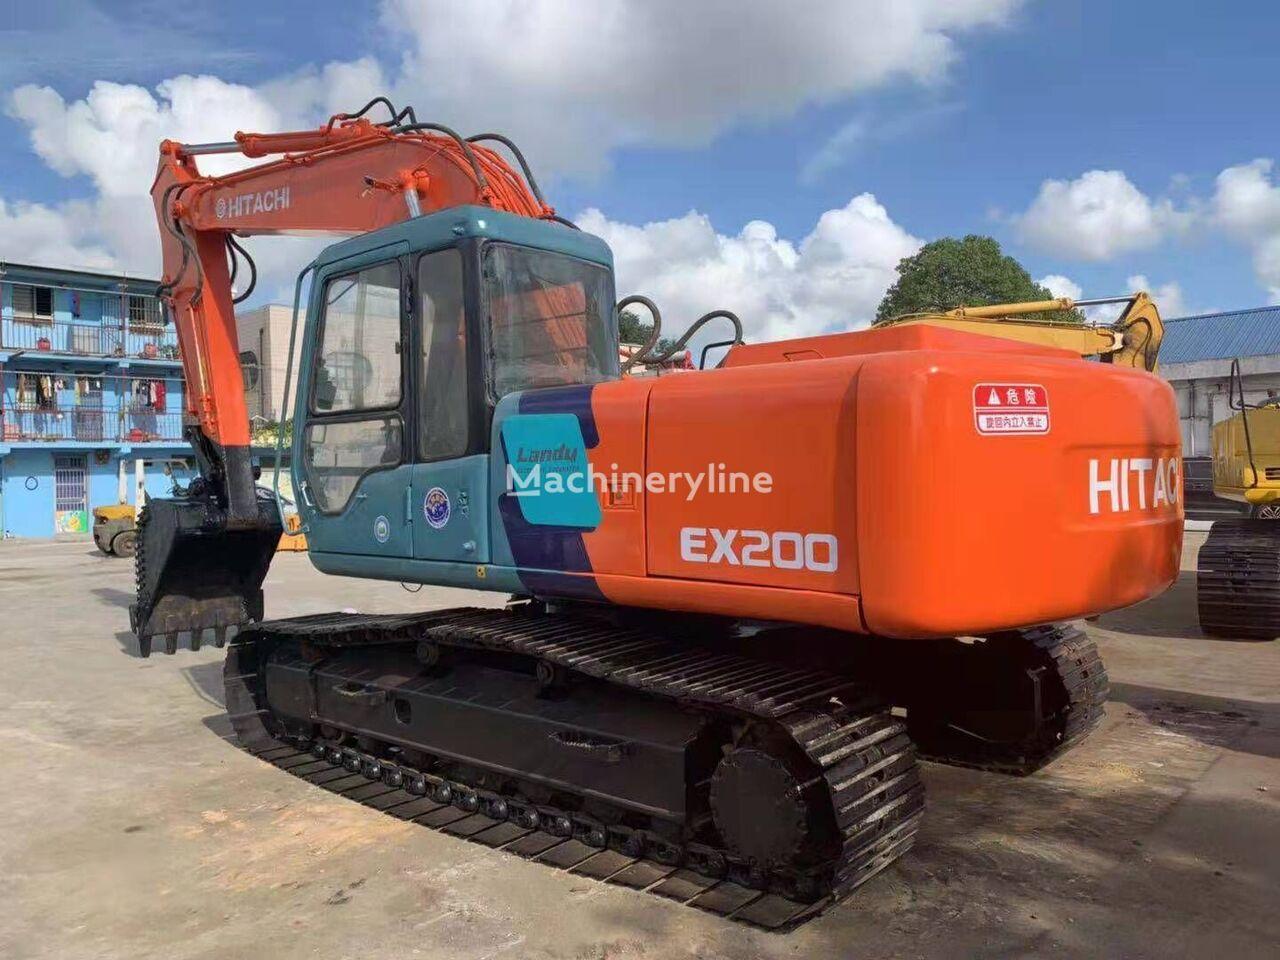 HITACHI EX200 walking excavator